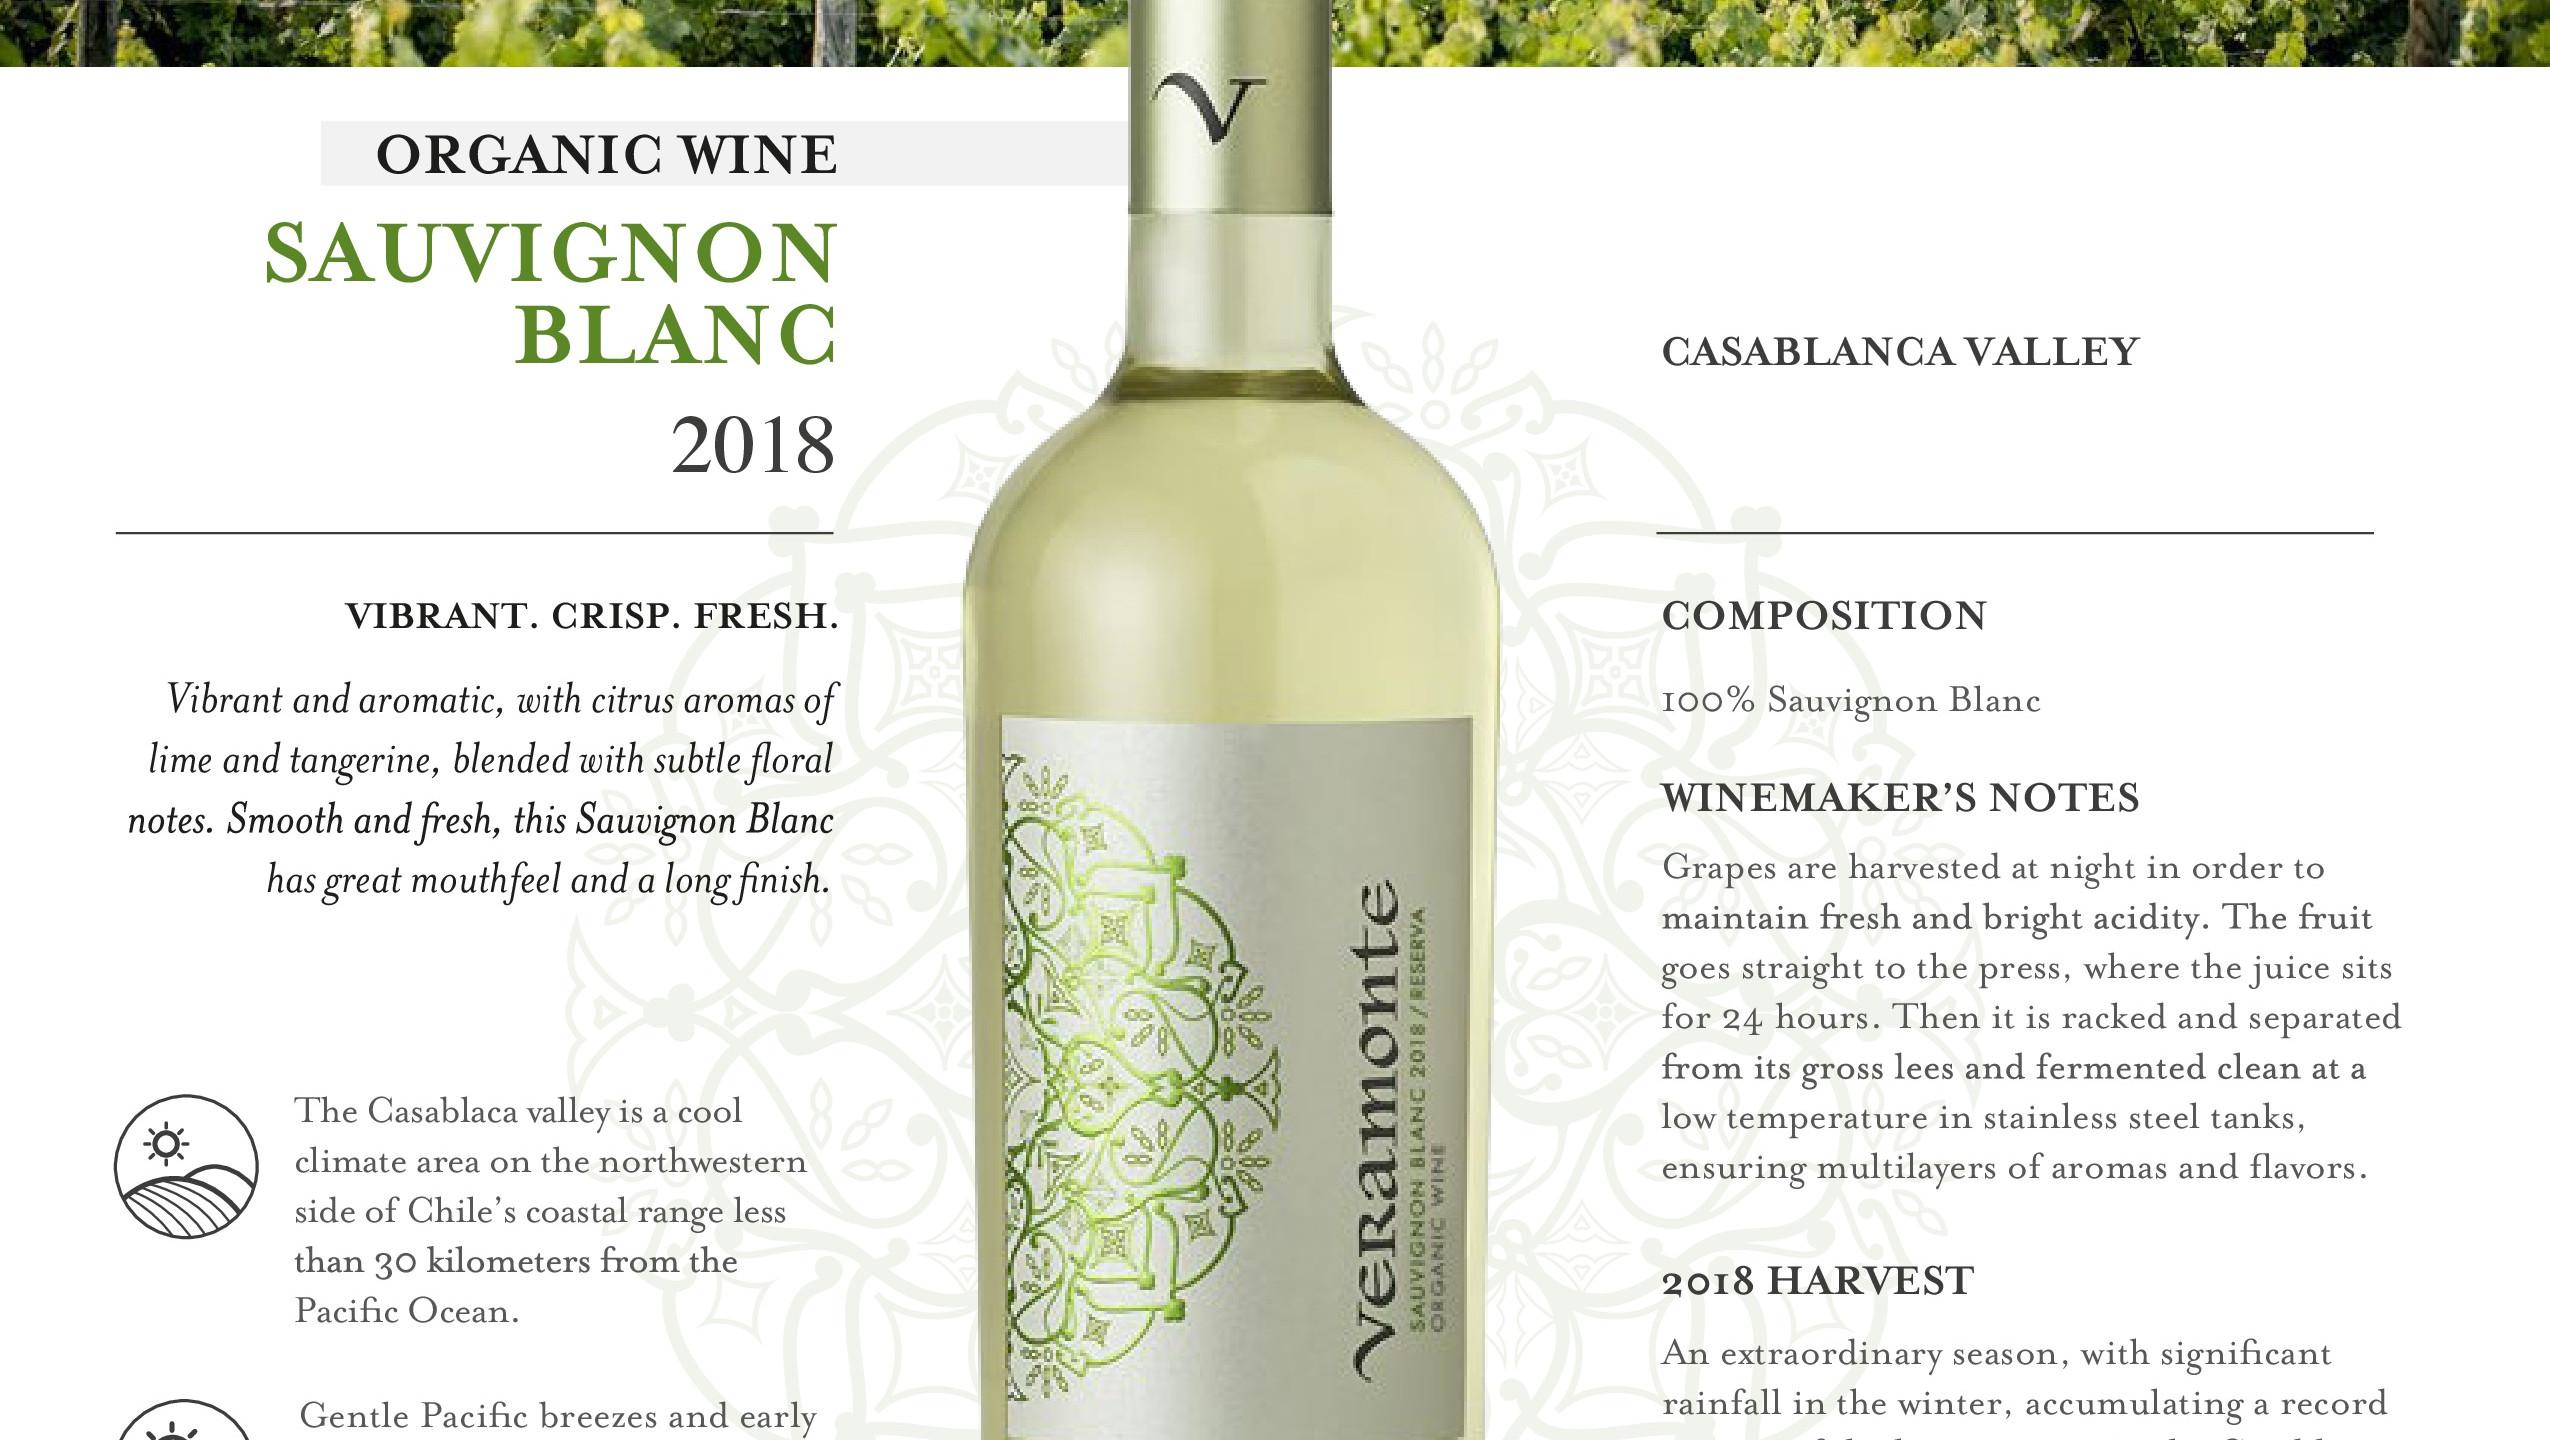 Veramonte Sauvignon Blanc ORGANIC 2018